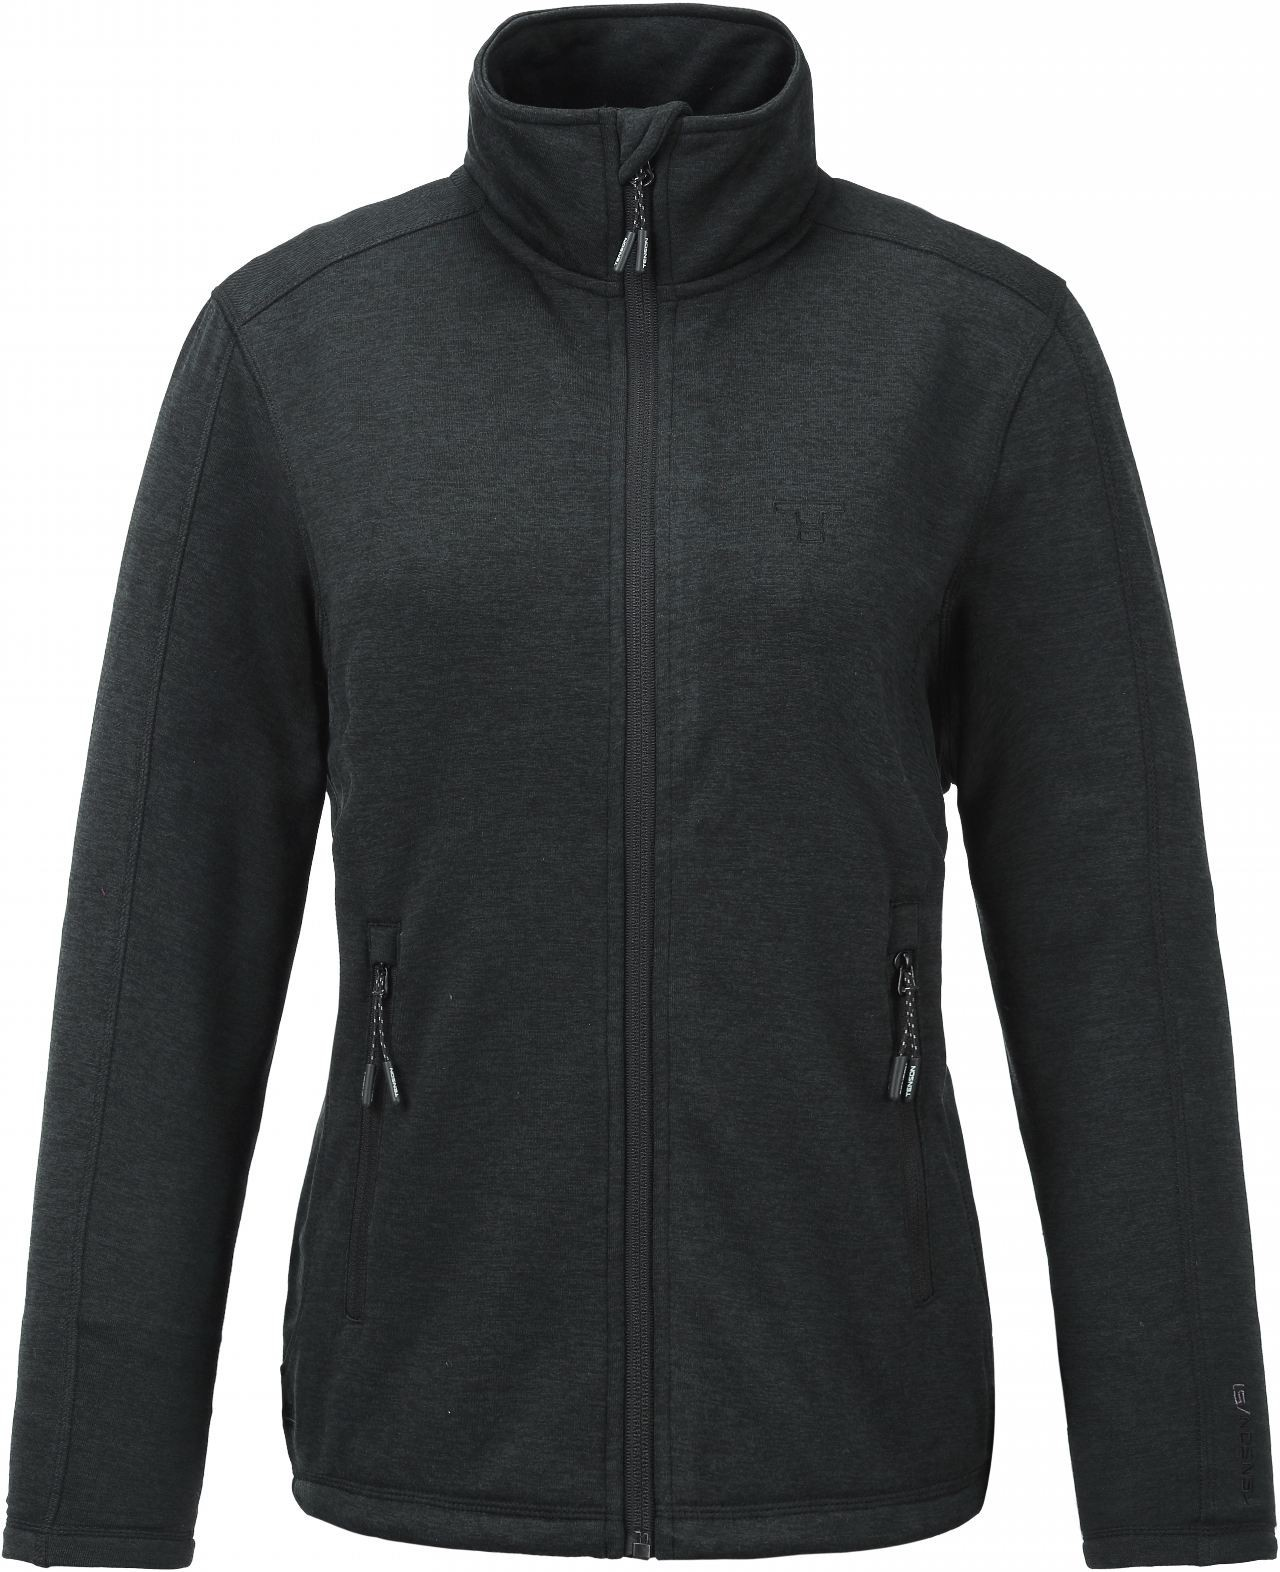 Bluza damska Tenson Lacy Fleece, czarna Black 36